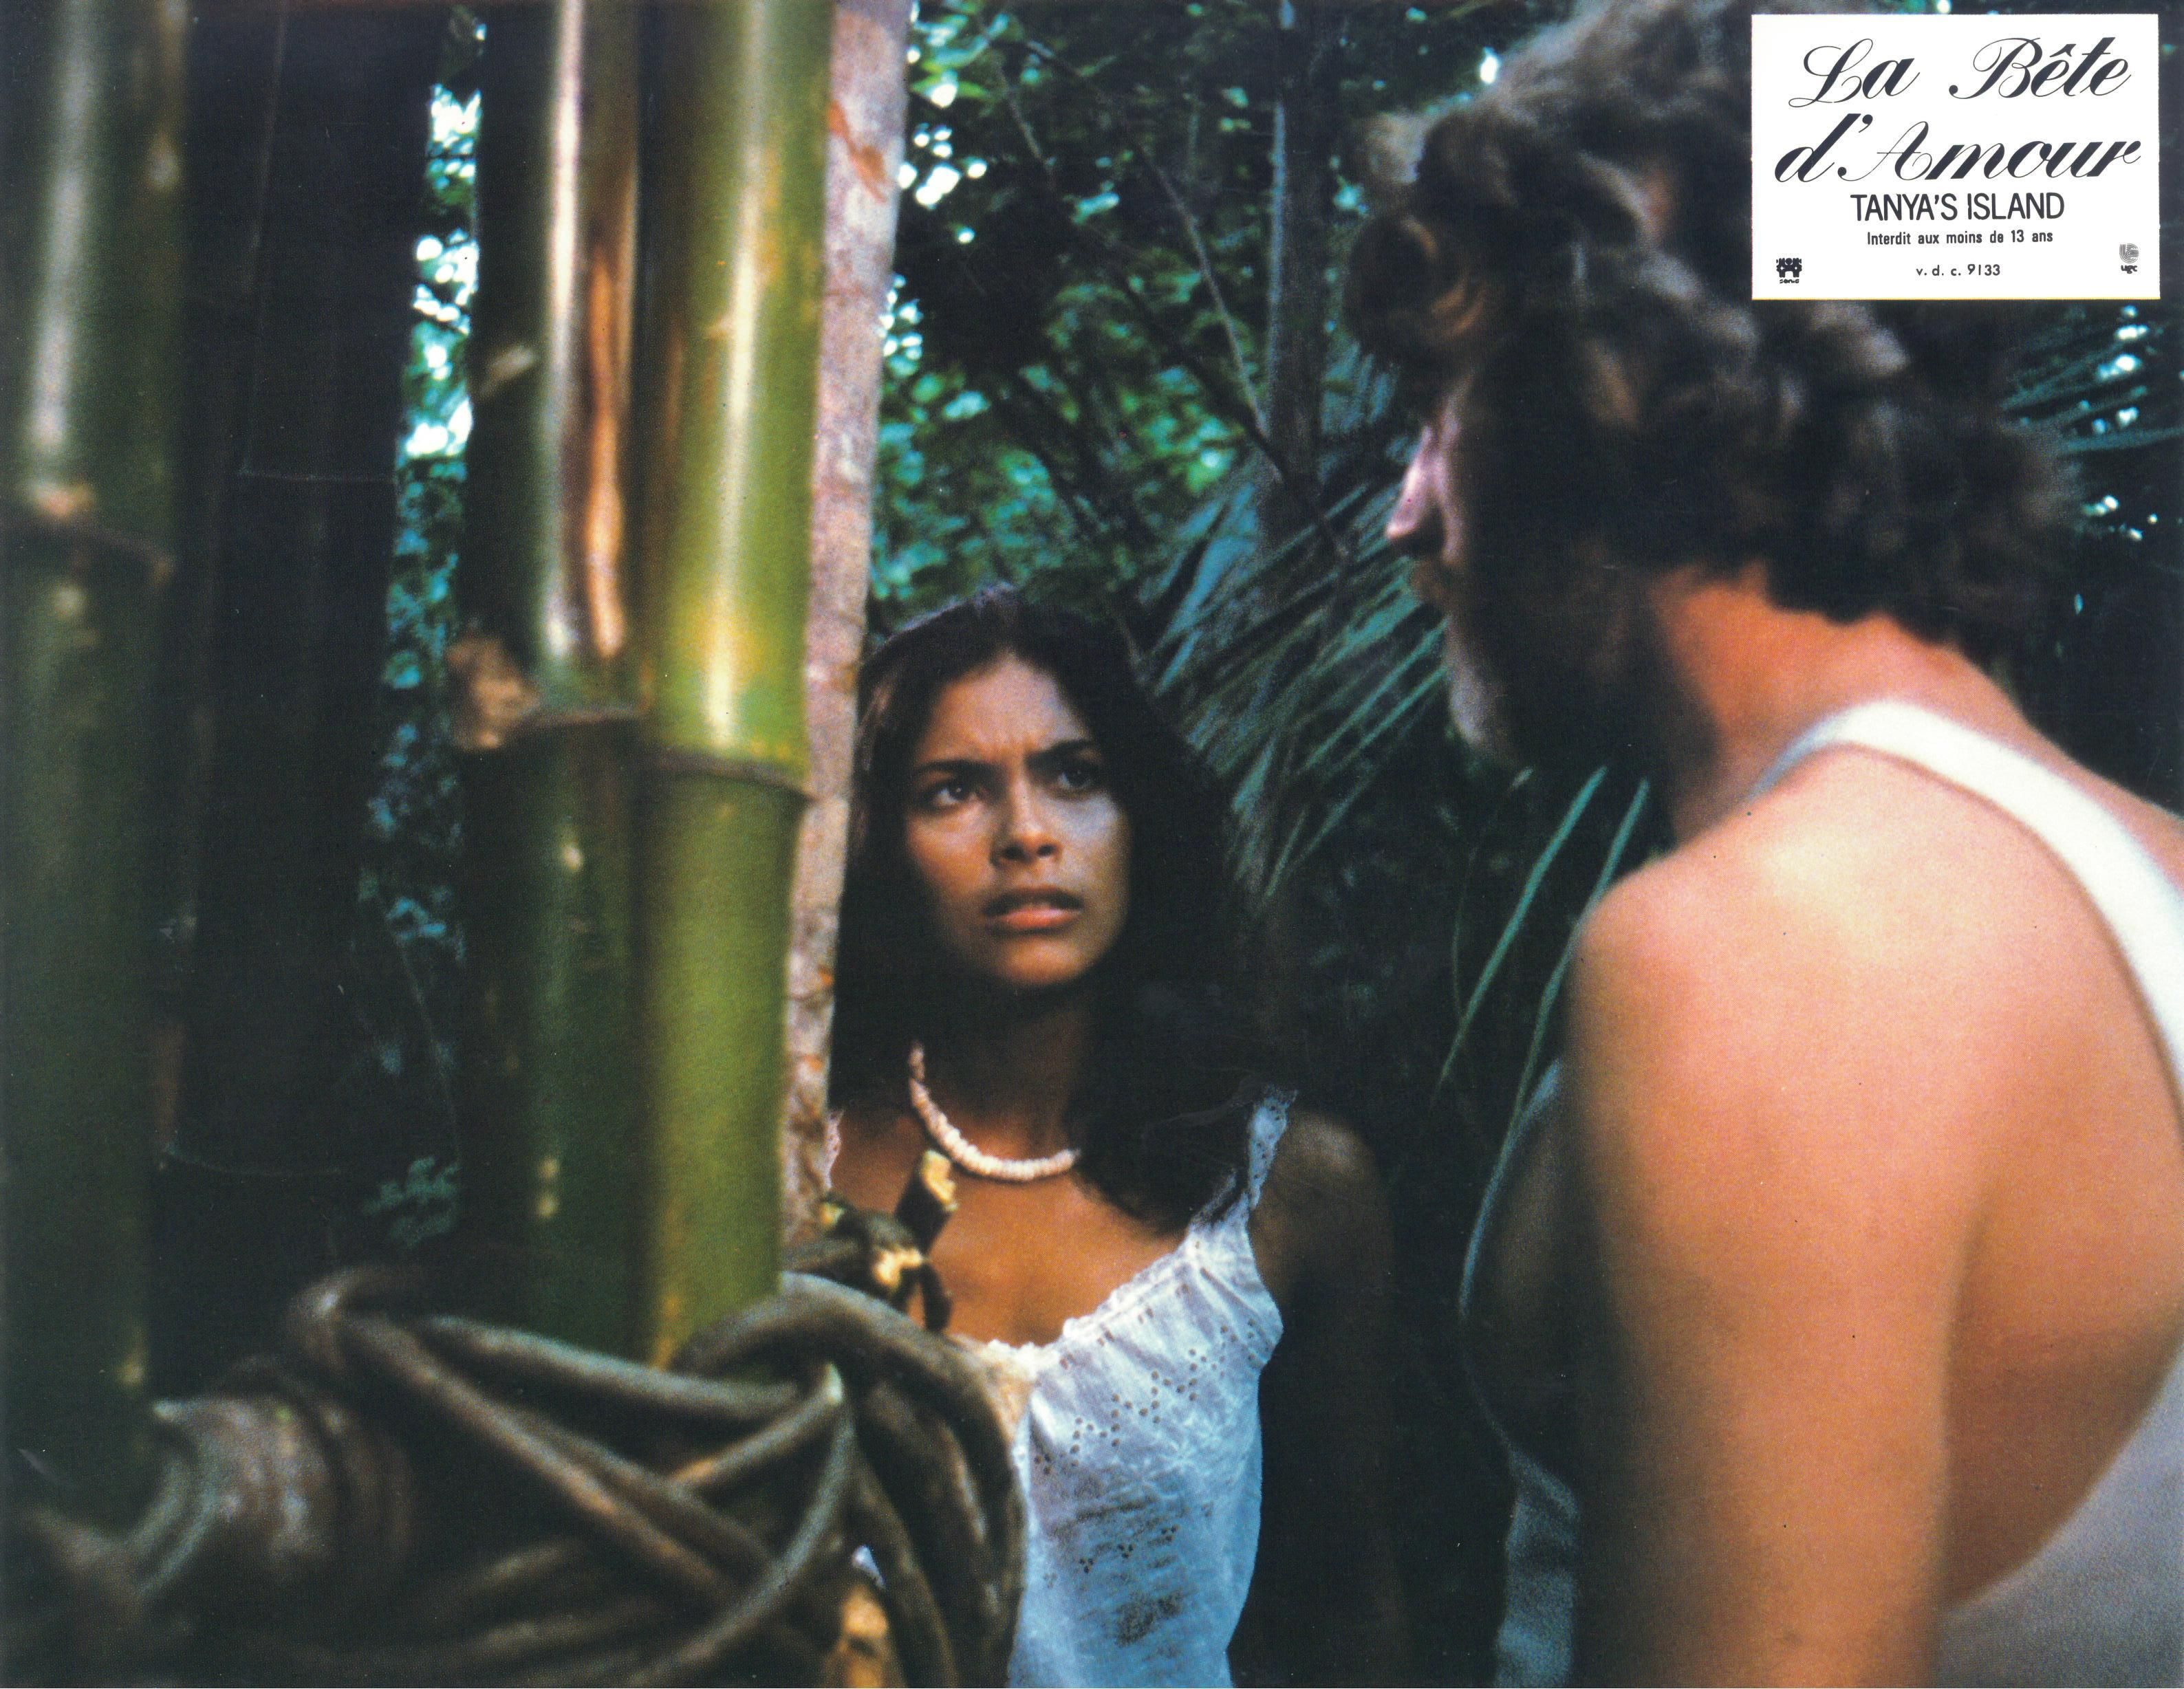 nude in matthews tanyas island denise